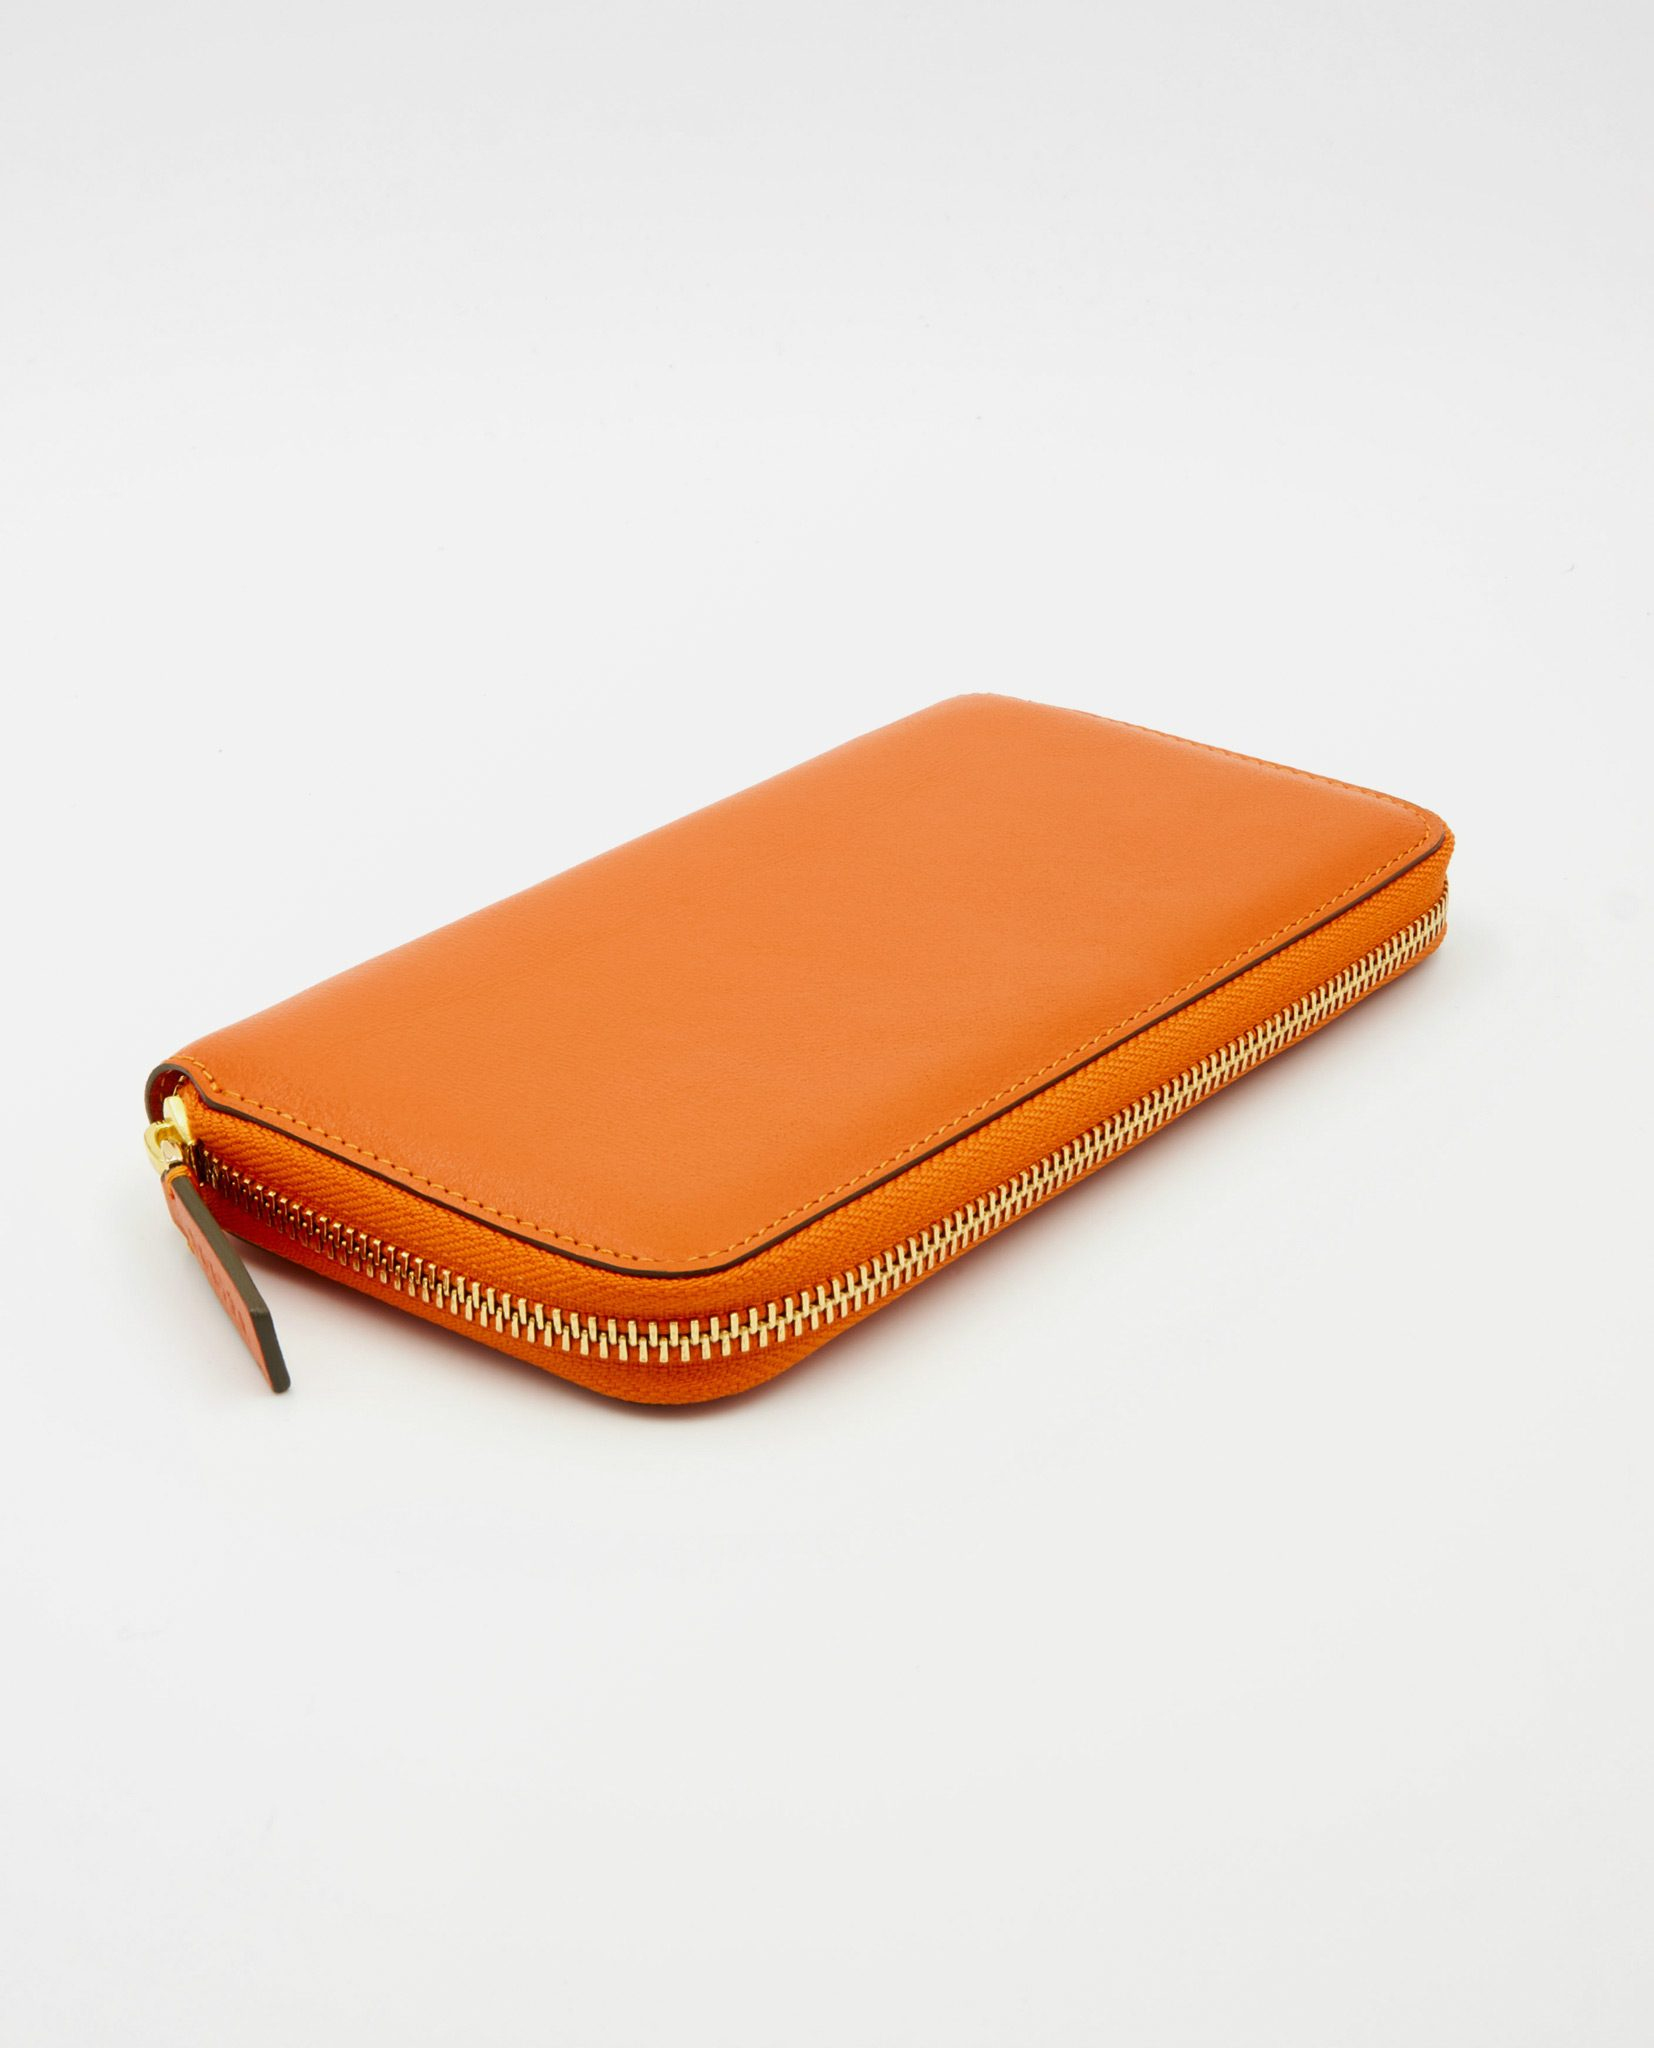 Soofre Women's Zip Wallet Crocodile Embossed Leather Orange-Khaki